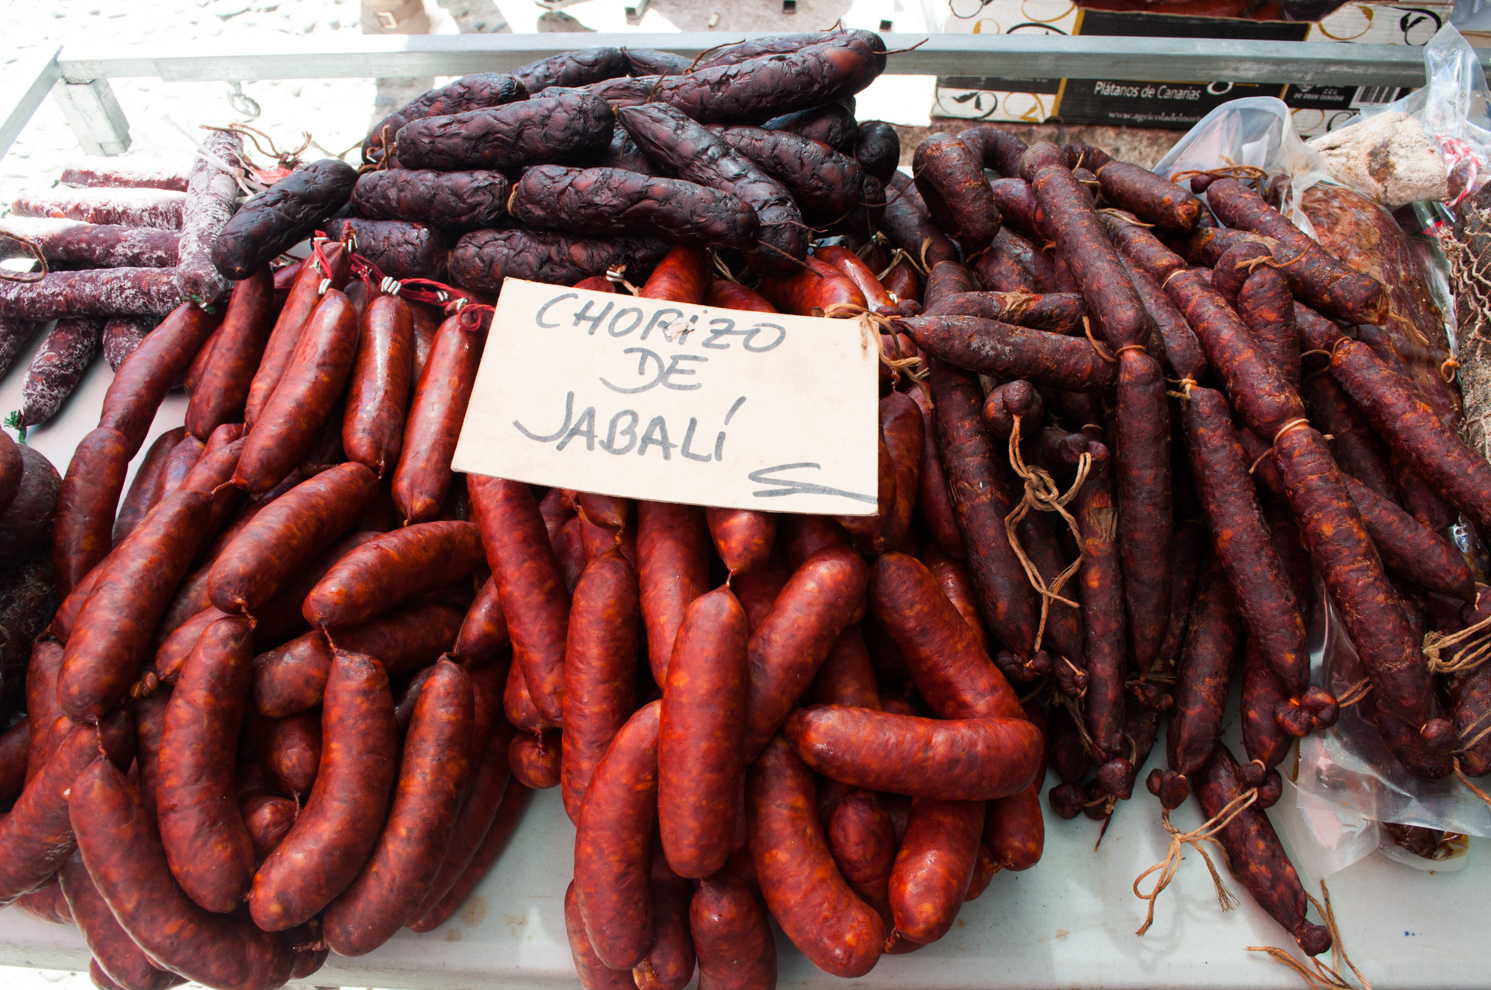 Mercado_de_Cangas_de_Onis_by_MonicaRGoya-10.jpg